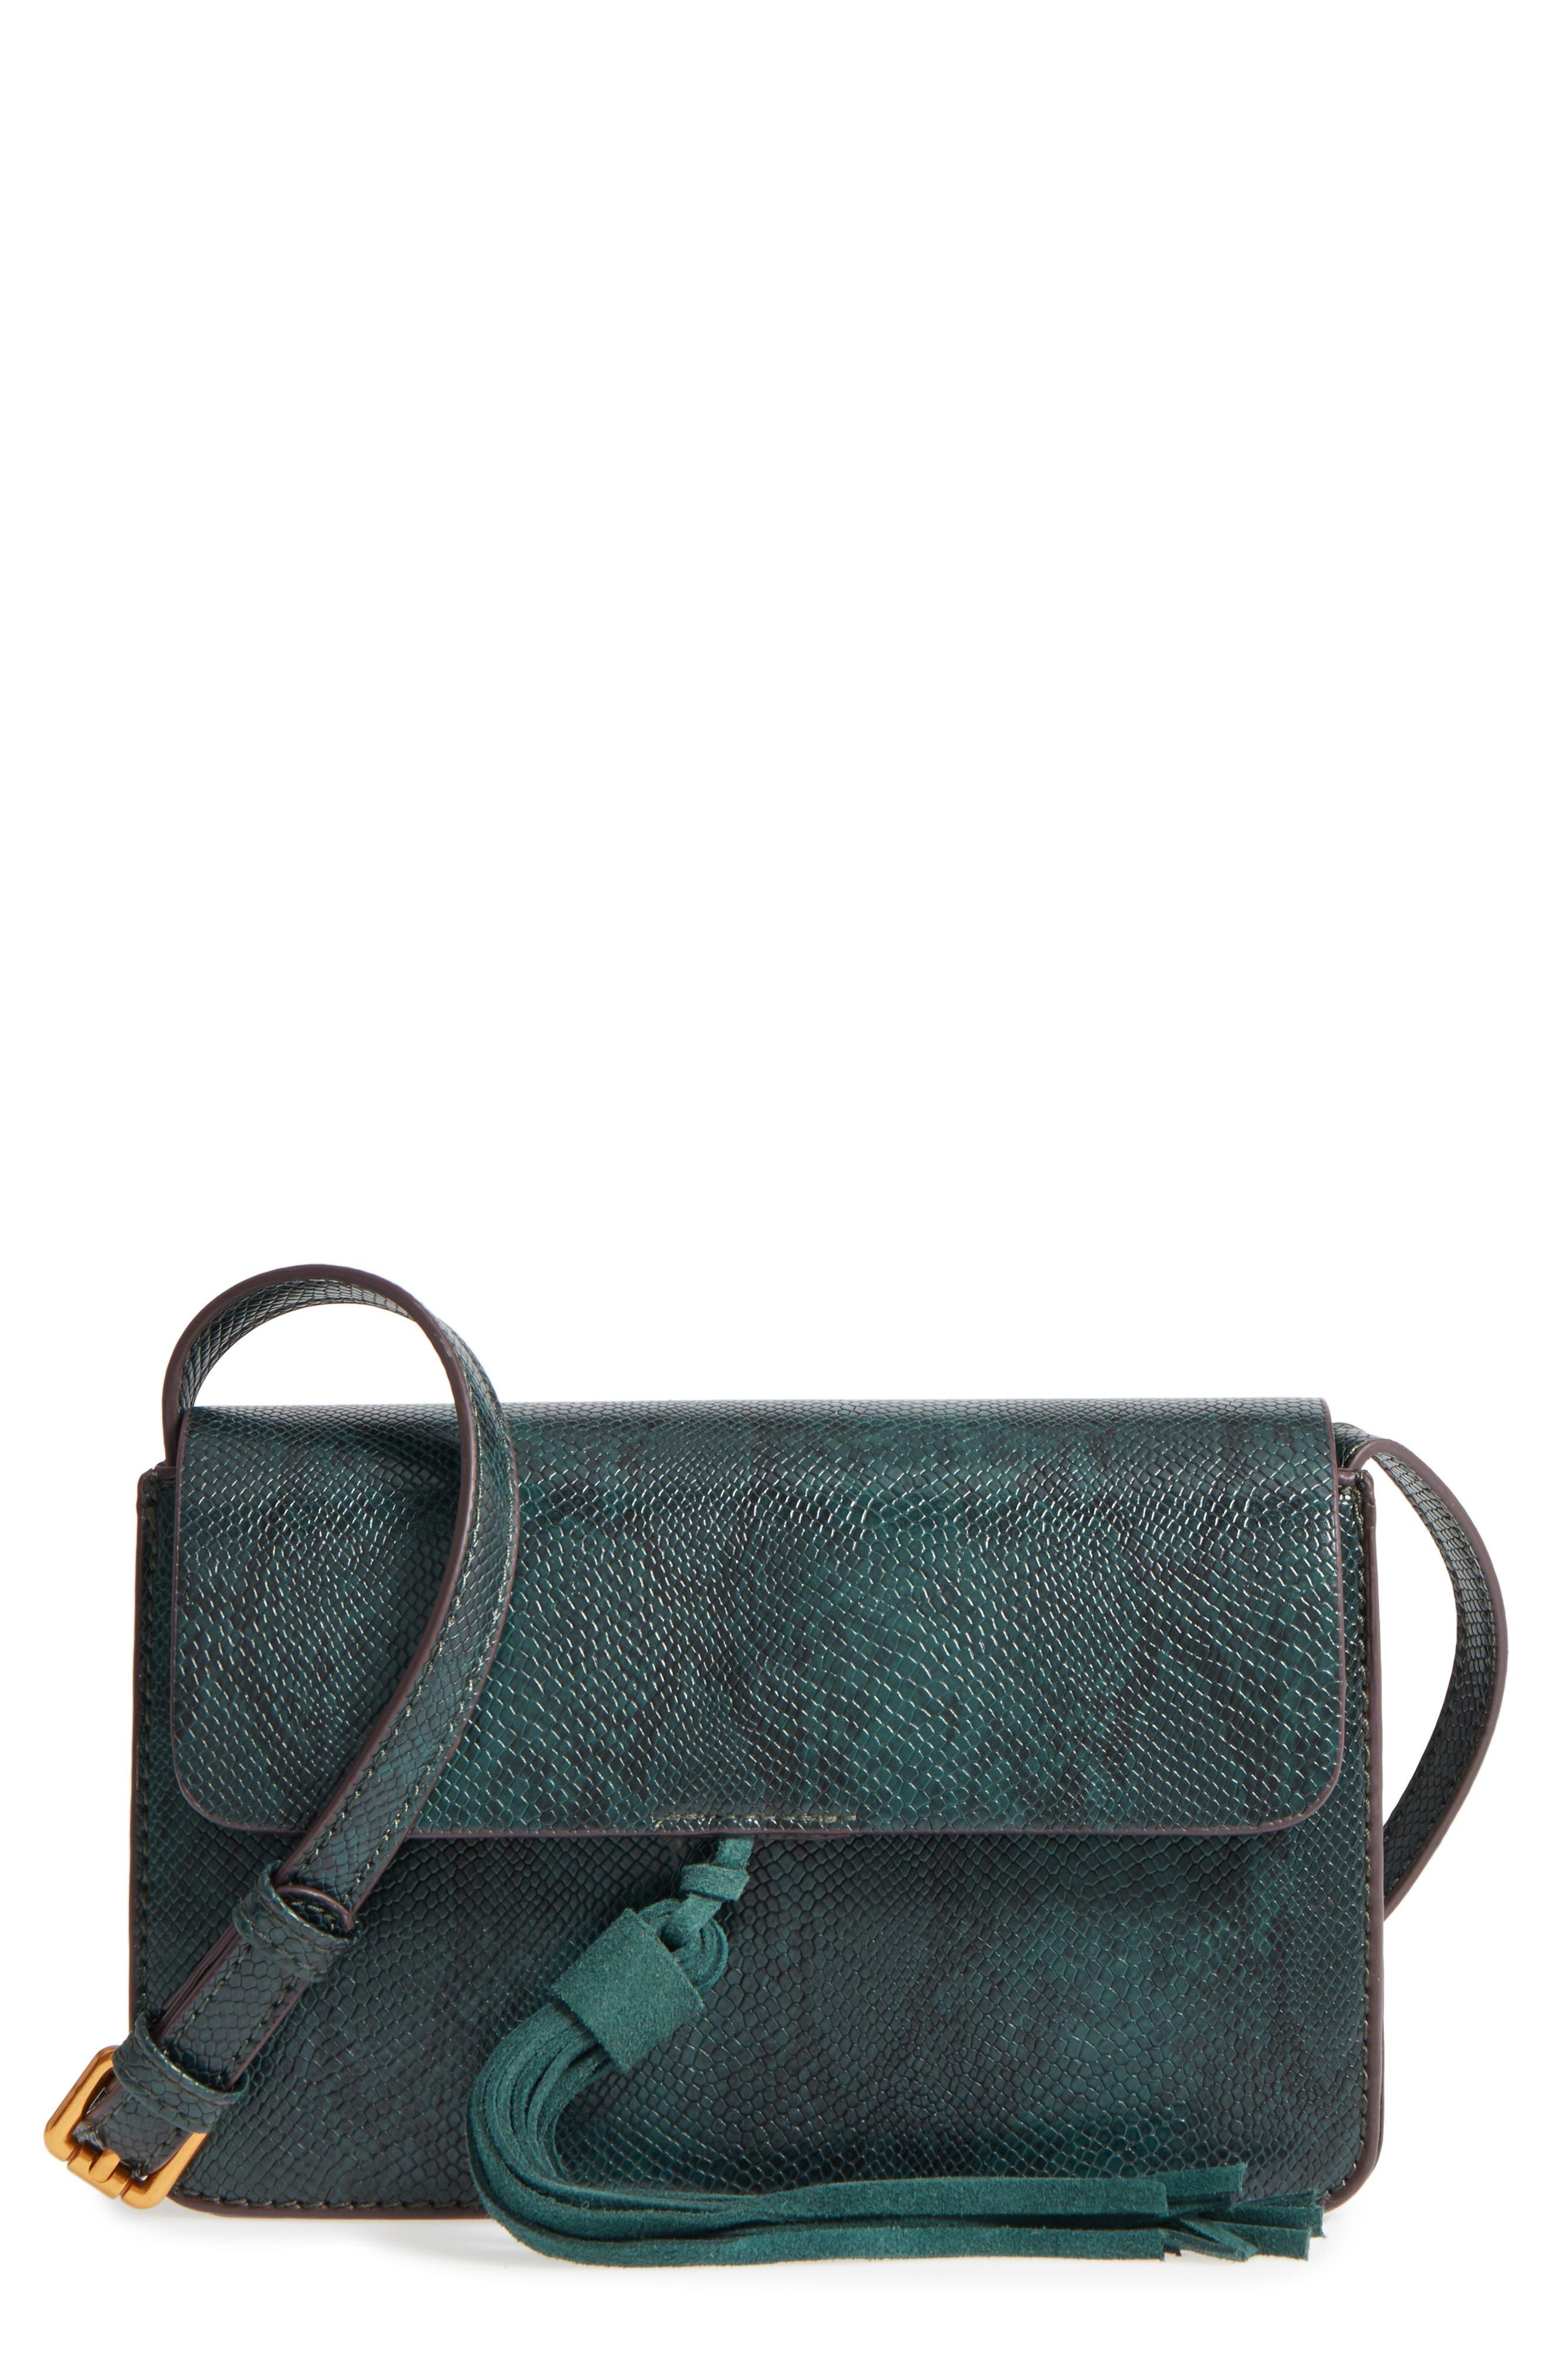 Main Image - Street Level Snake Embossed Faux Leather Crossbody Bag